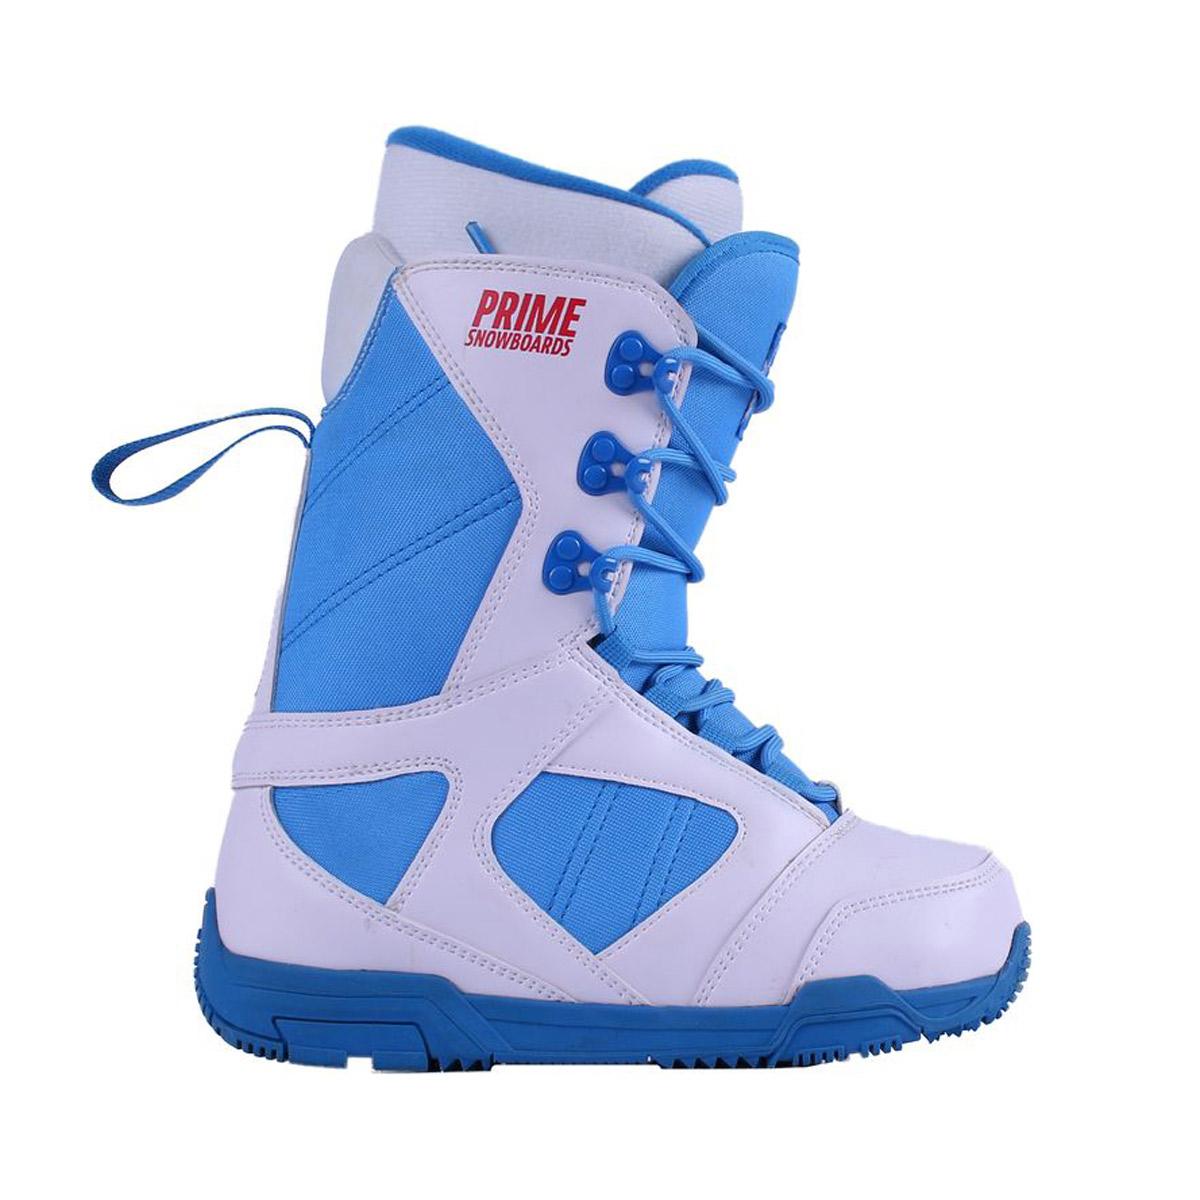 Ботинки для сноуборда PRIME Classic White/Blue 2018